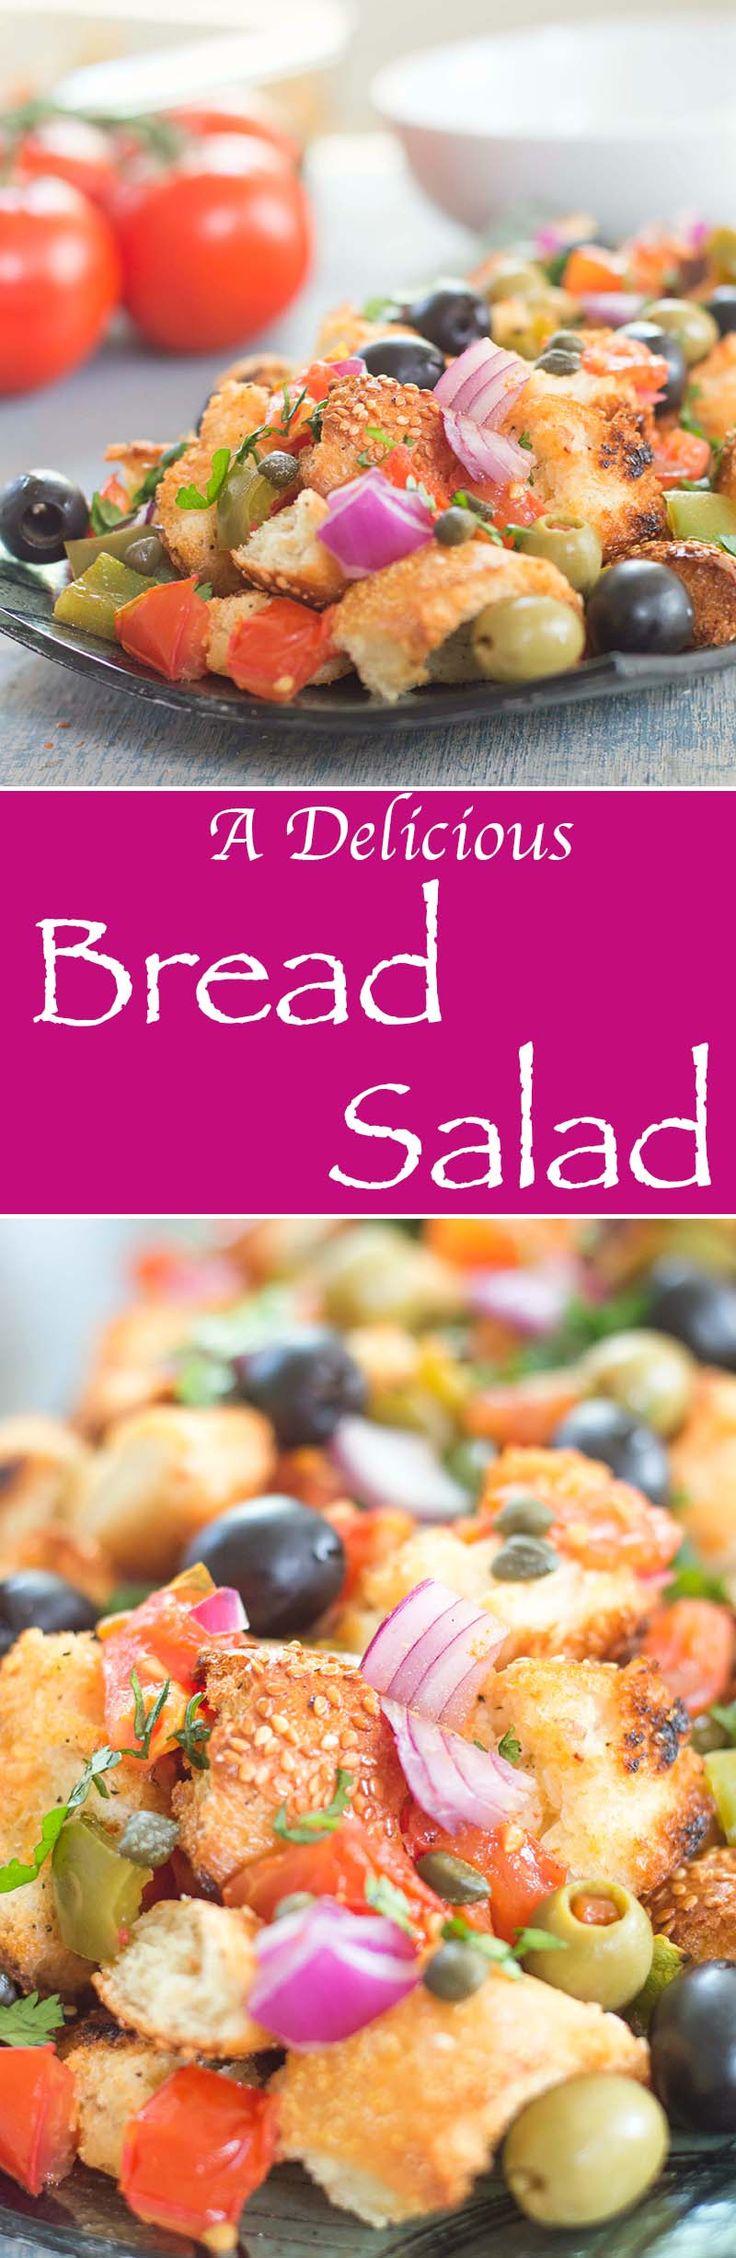 Simple Bread Salad Made Greek Style